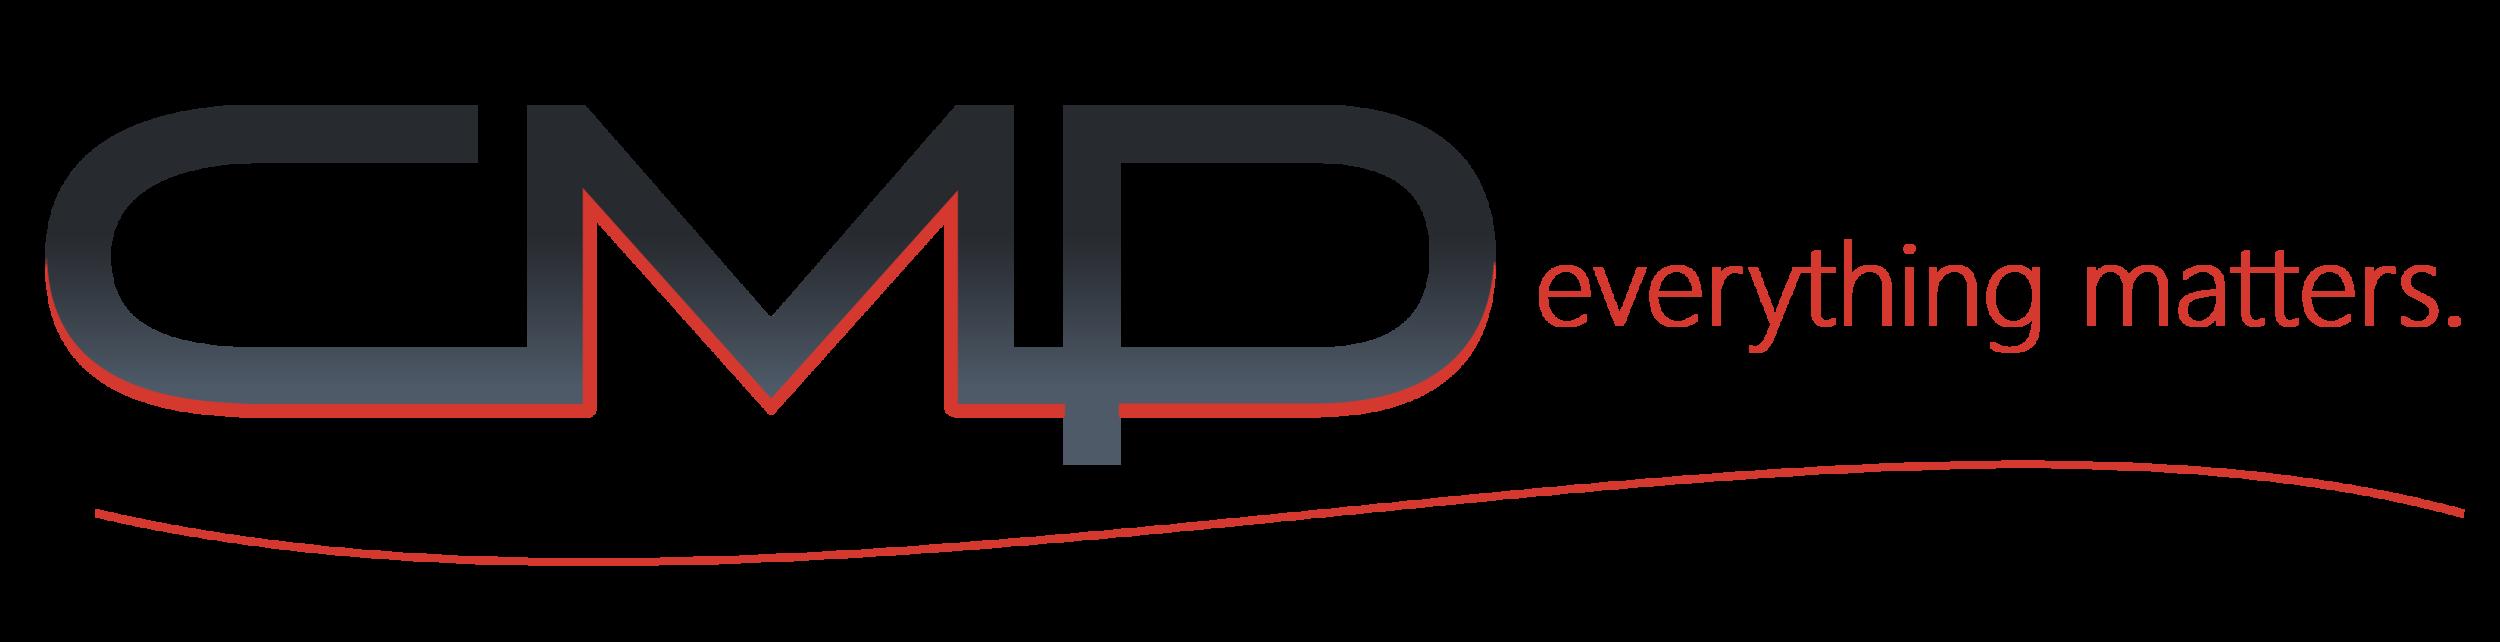 2013-CMP-Logo_Lockup-w-Strapline.png